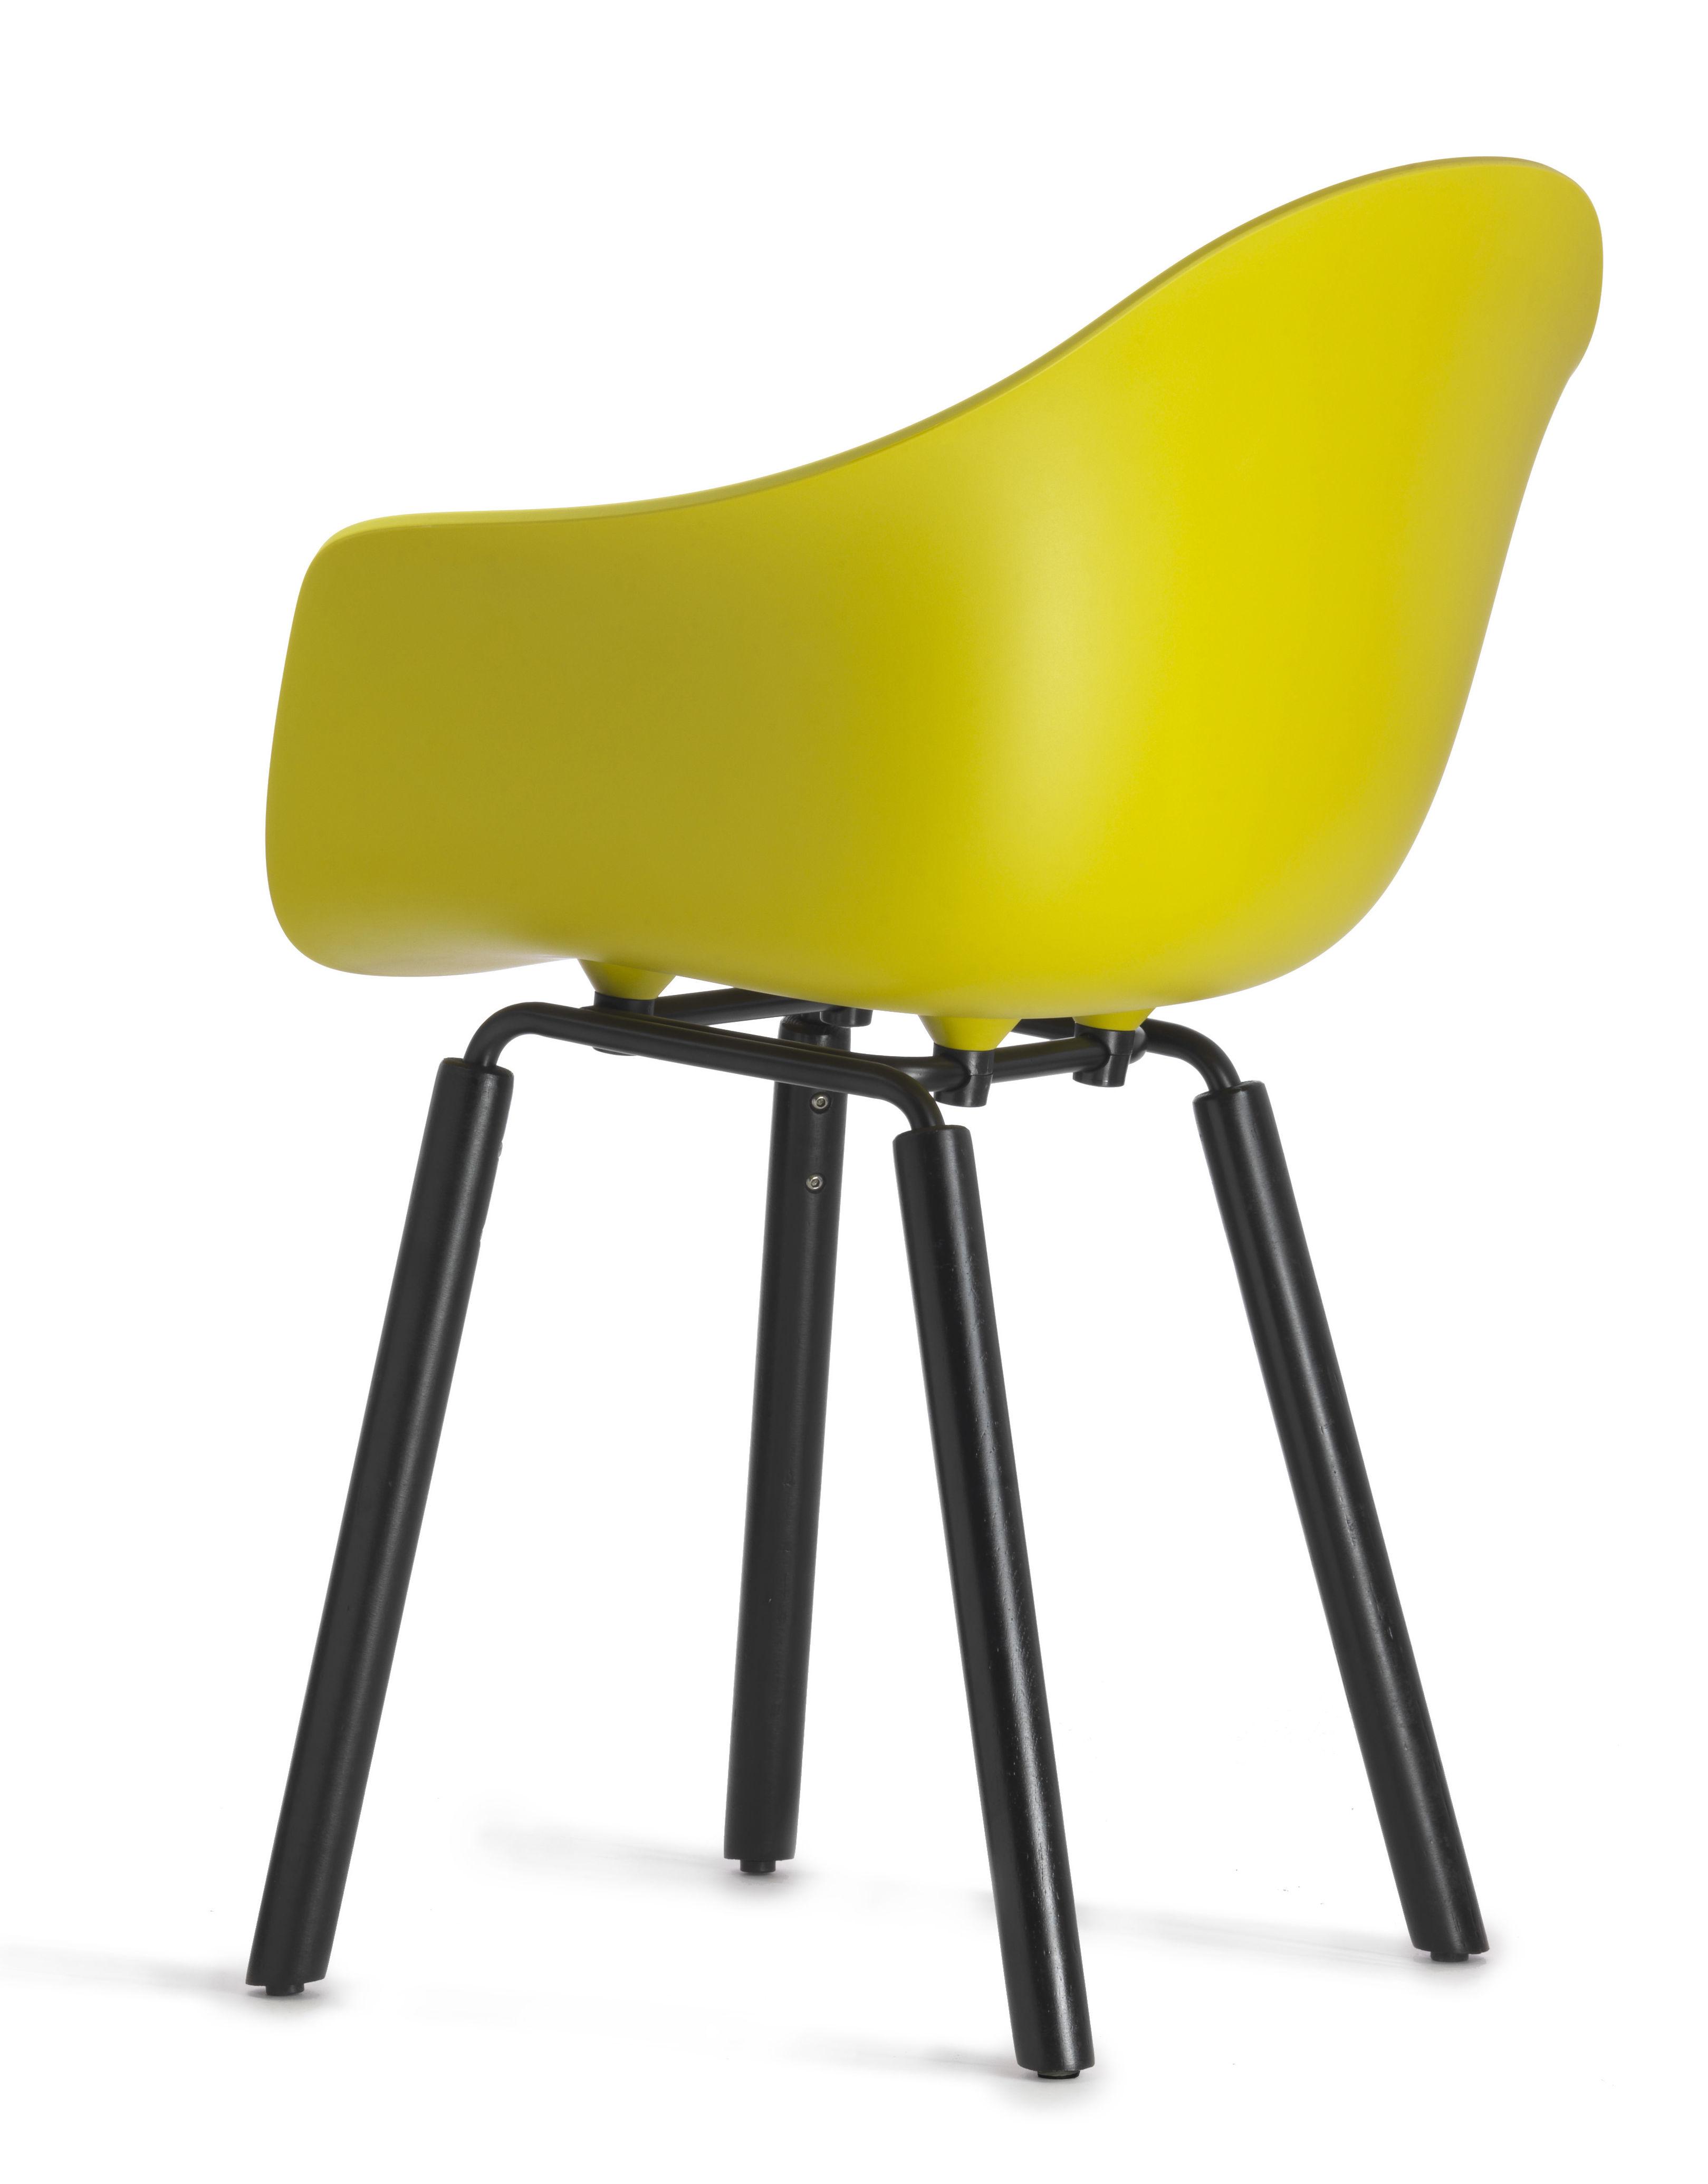 fauteuil ta pieds bois jaune moutarde pieds noirs toou. Black Bedroom Furniture Sets. Home Design Ideas